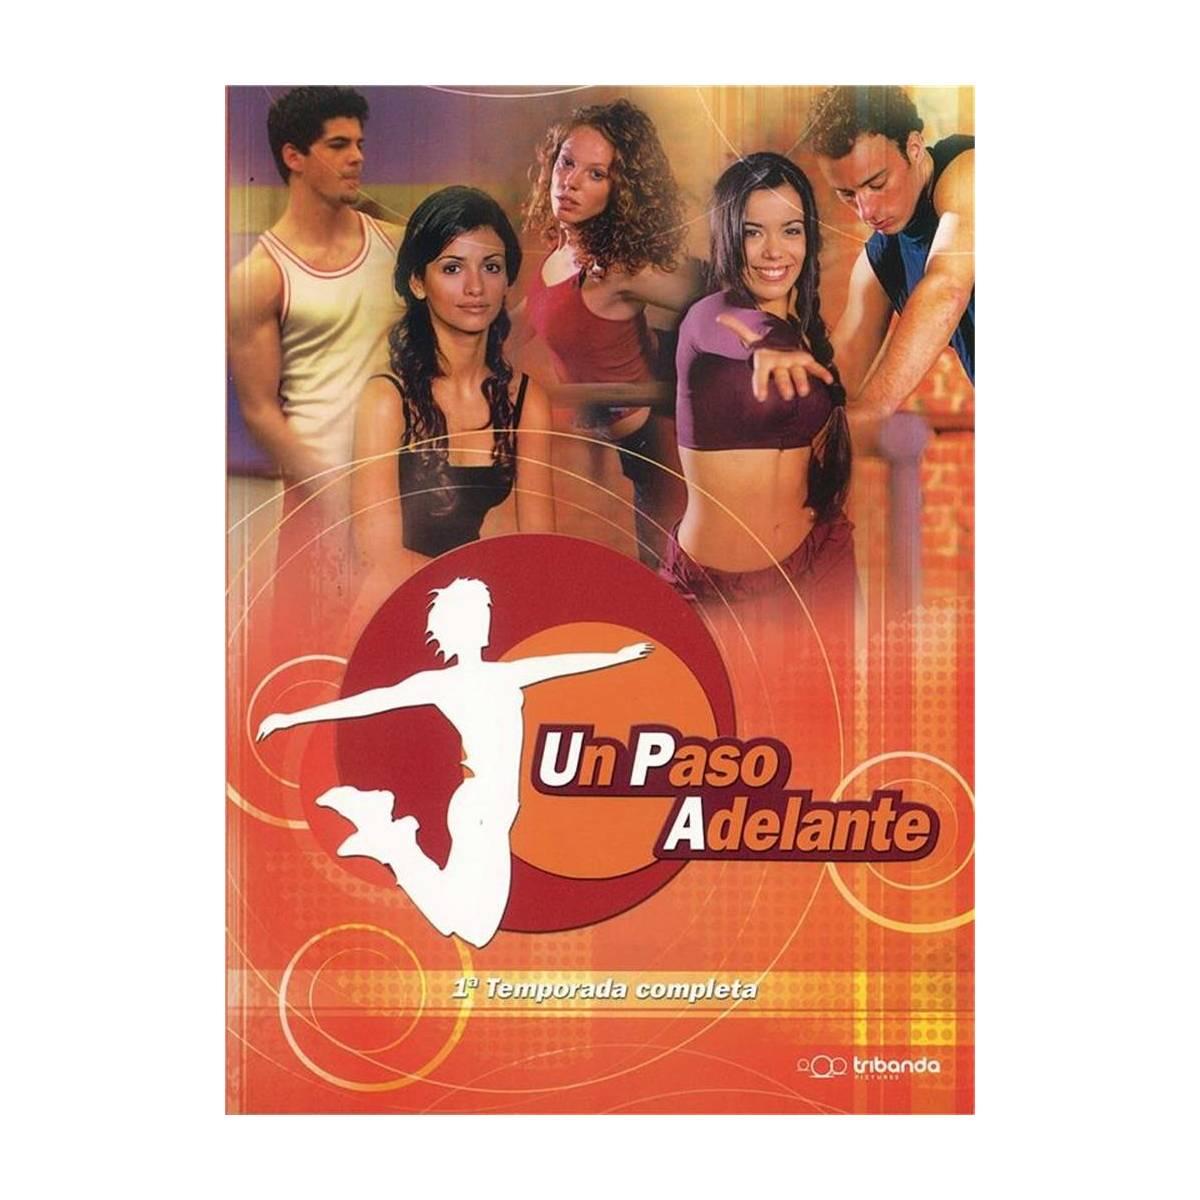 Un Paso Adelante - 1ª Temporada CompletaUn Paso Adelante Pelicula Completa En Espanol